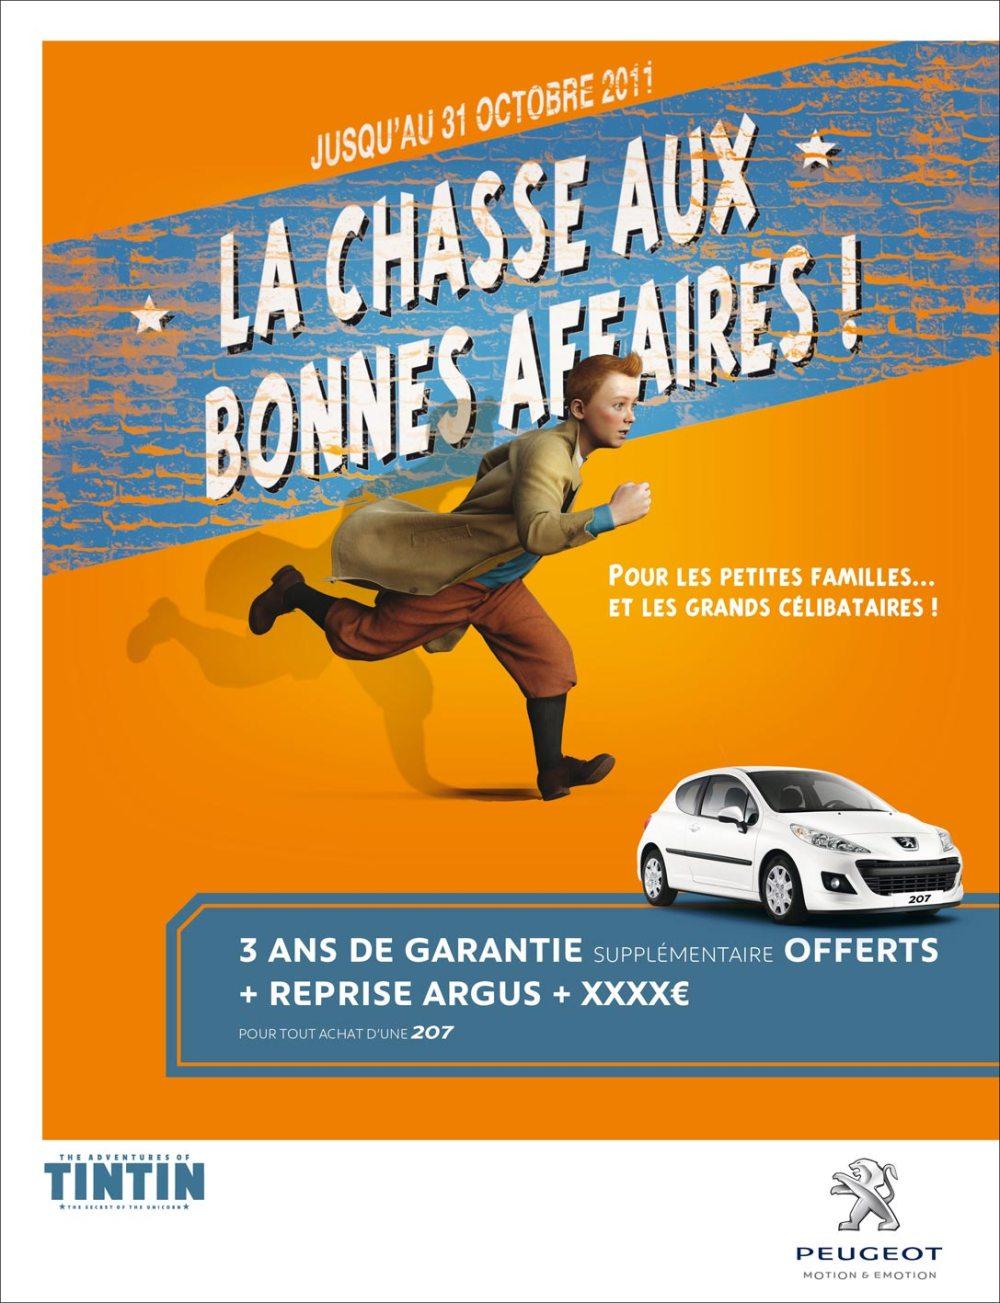 Peugeot Event Tintin 2